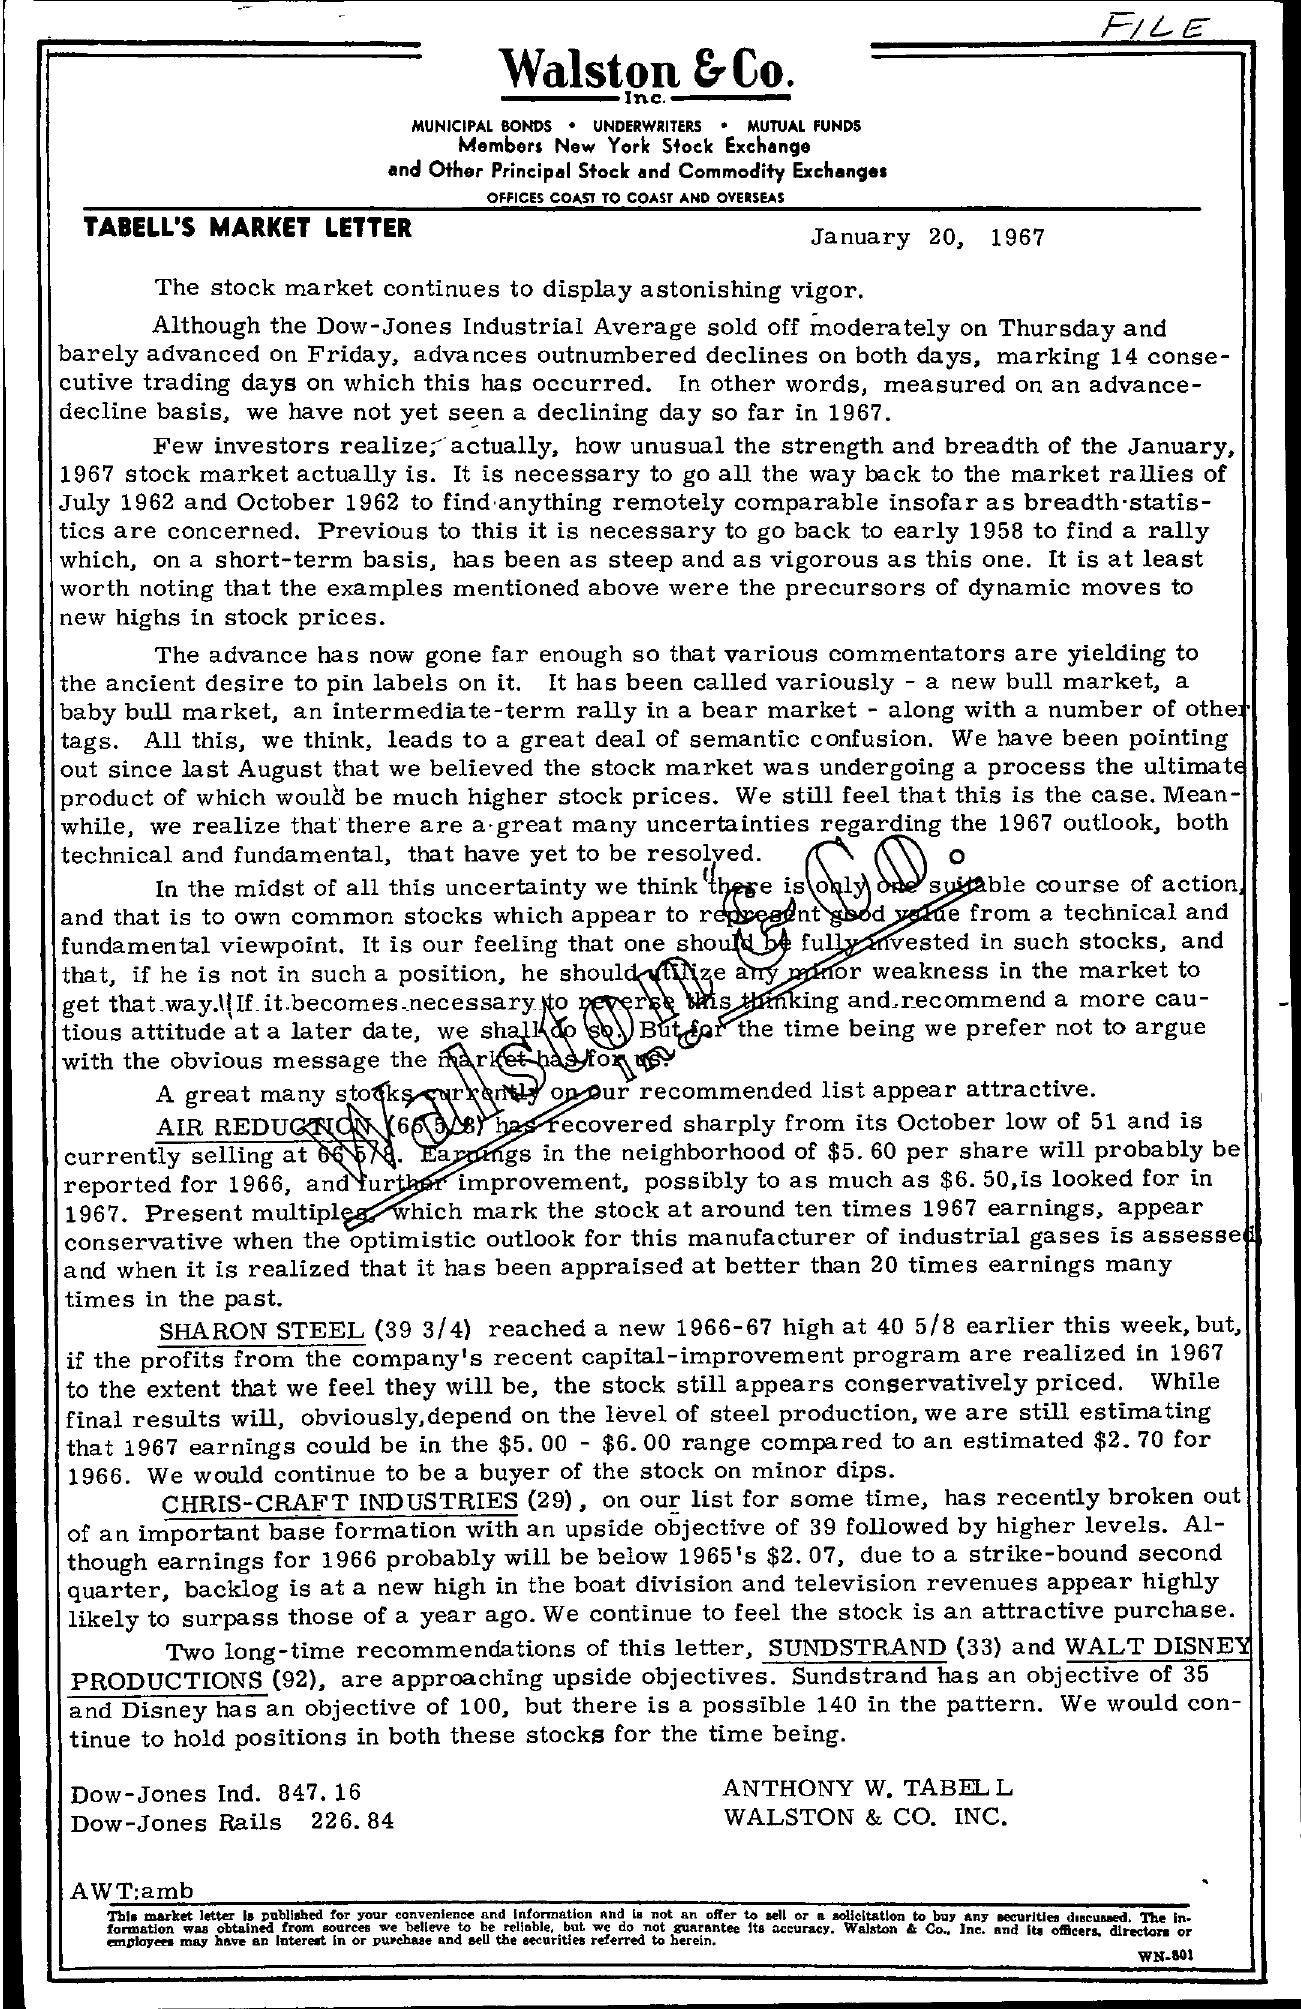 Tabell's Market Letter - January 20, 1967